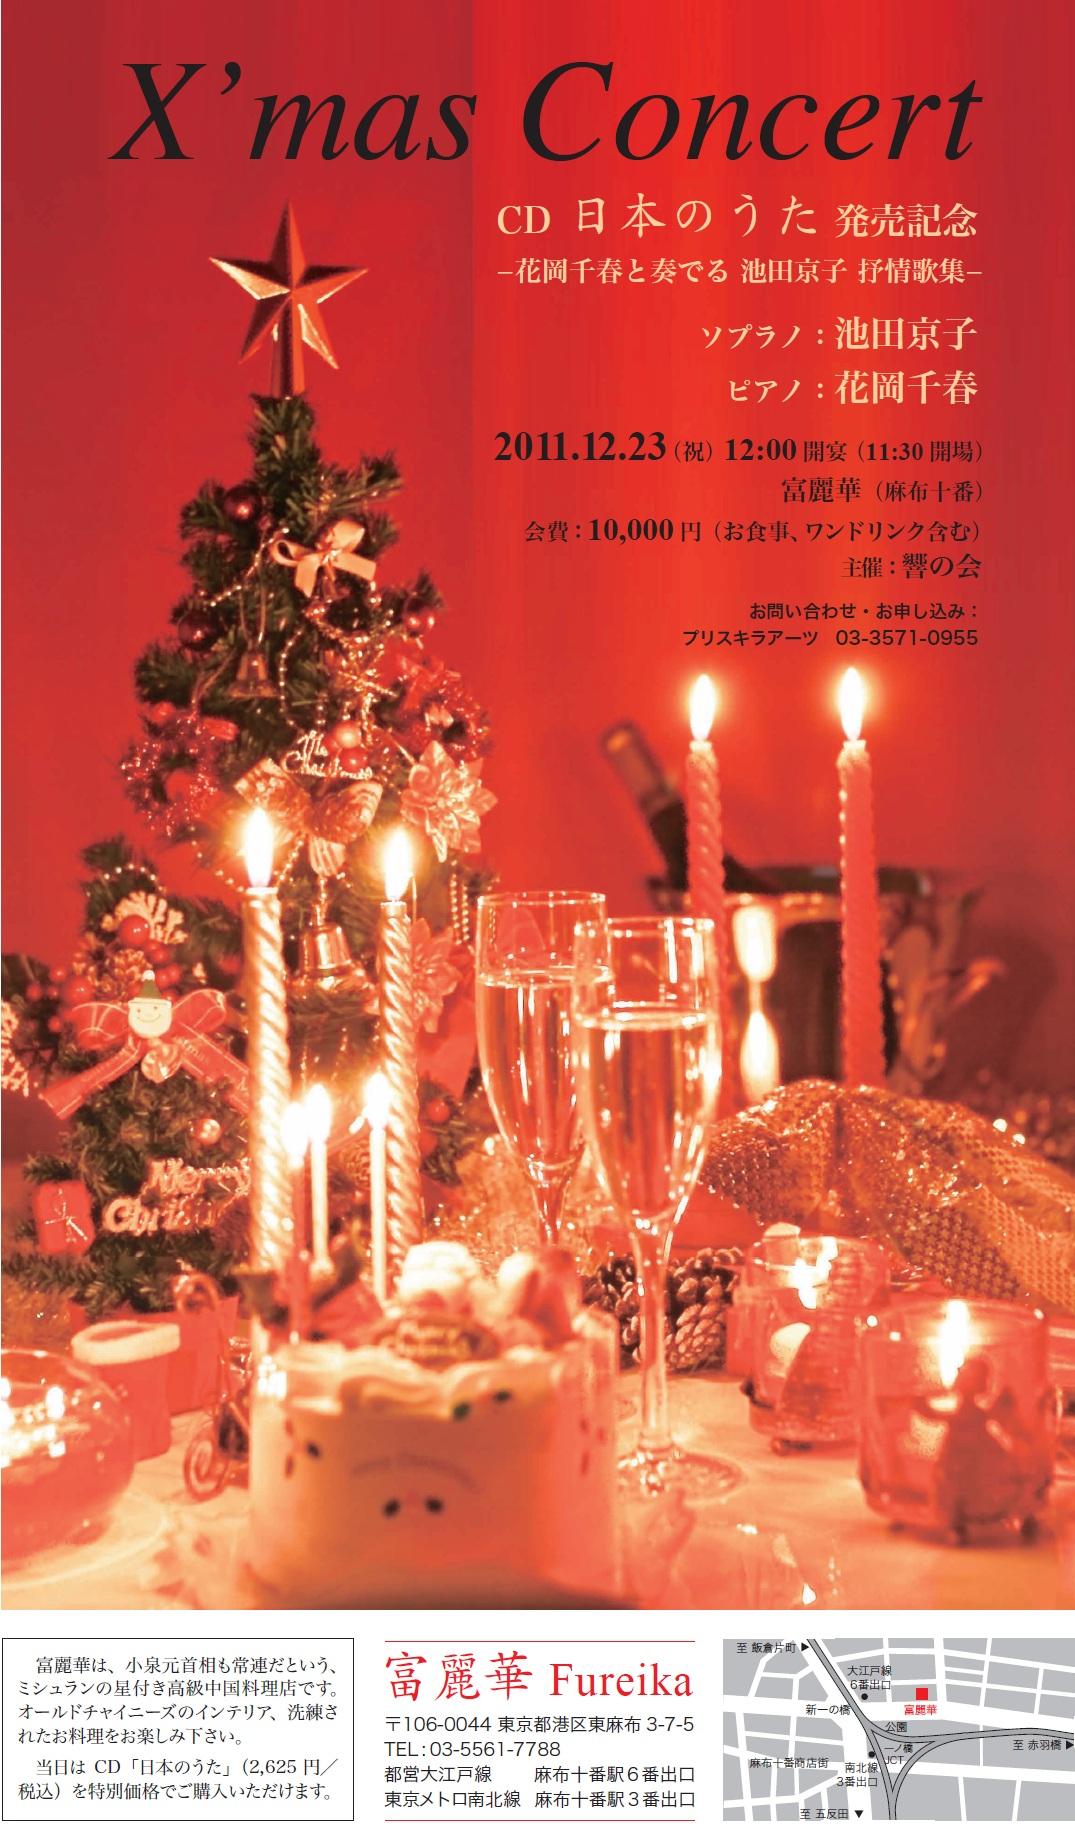 X'mas Concert (CD日本のうた発売記念) ~花岡千春と奏でる池田京子 抒情歌集~